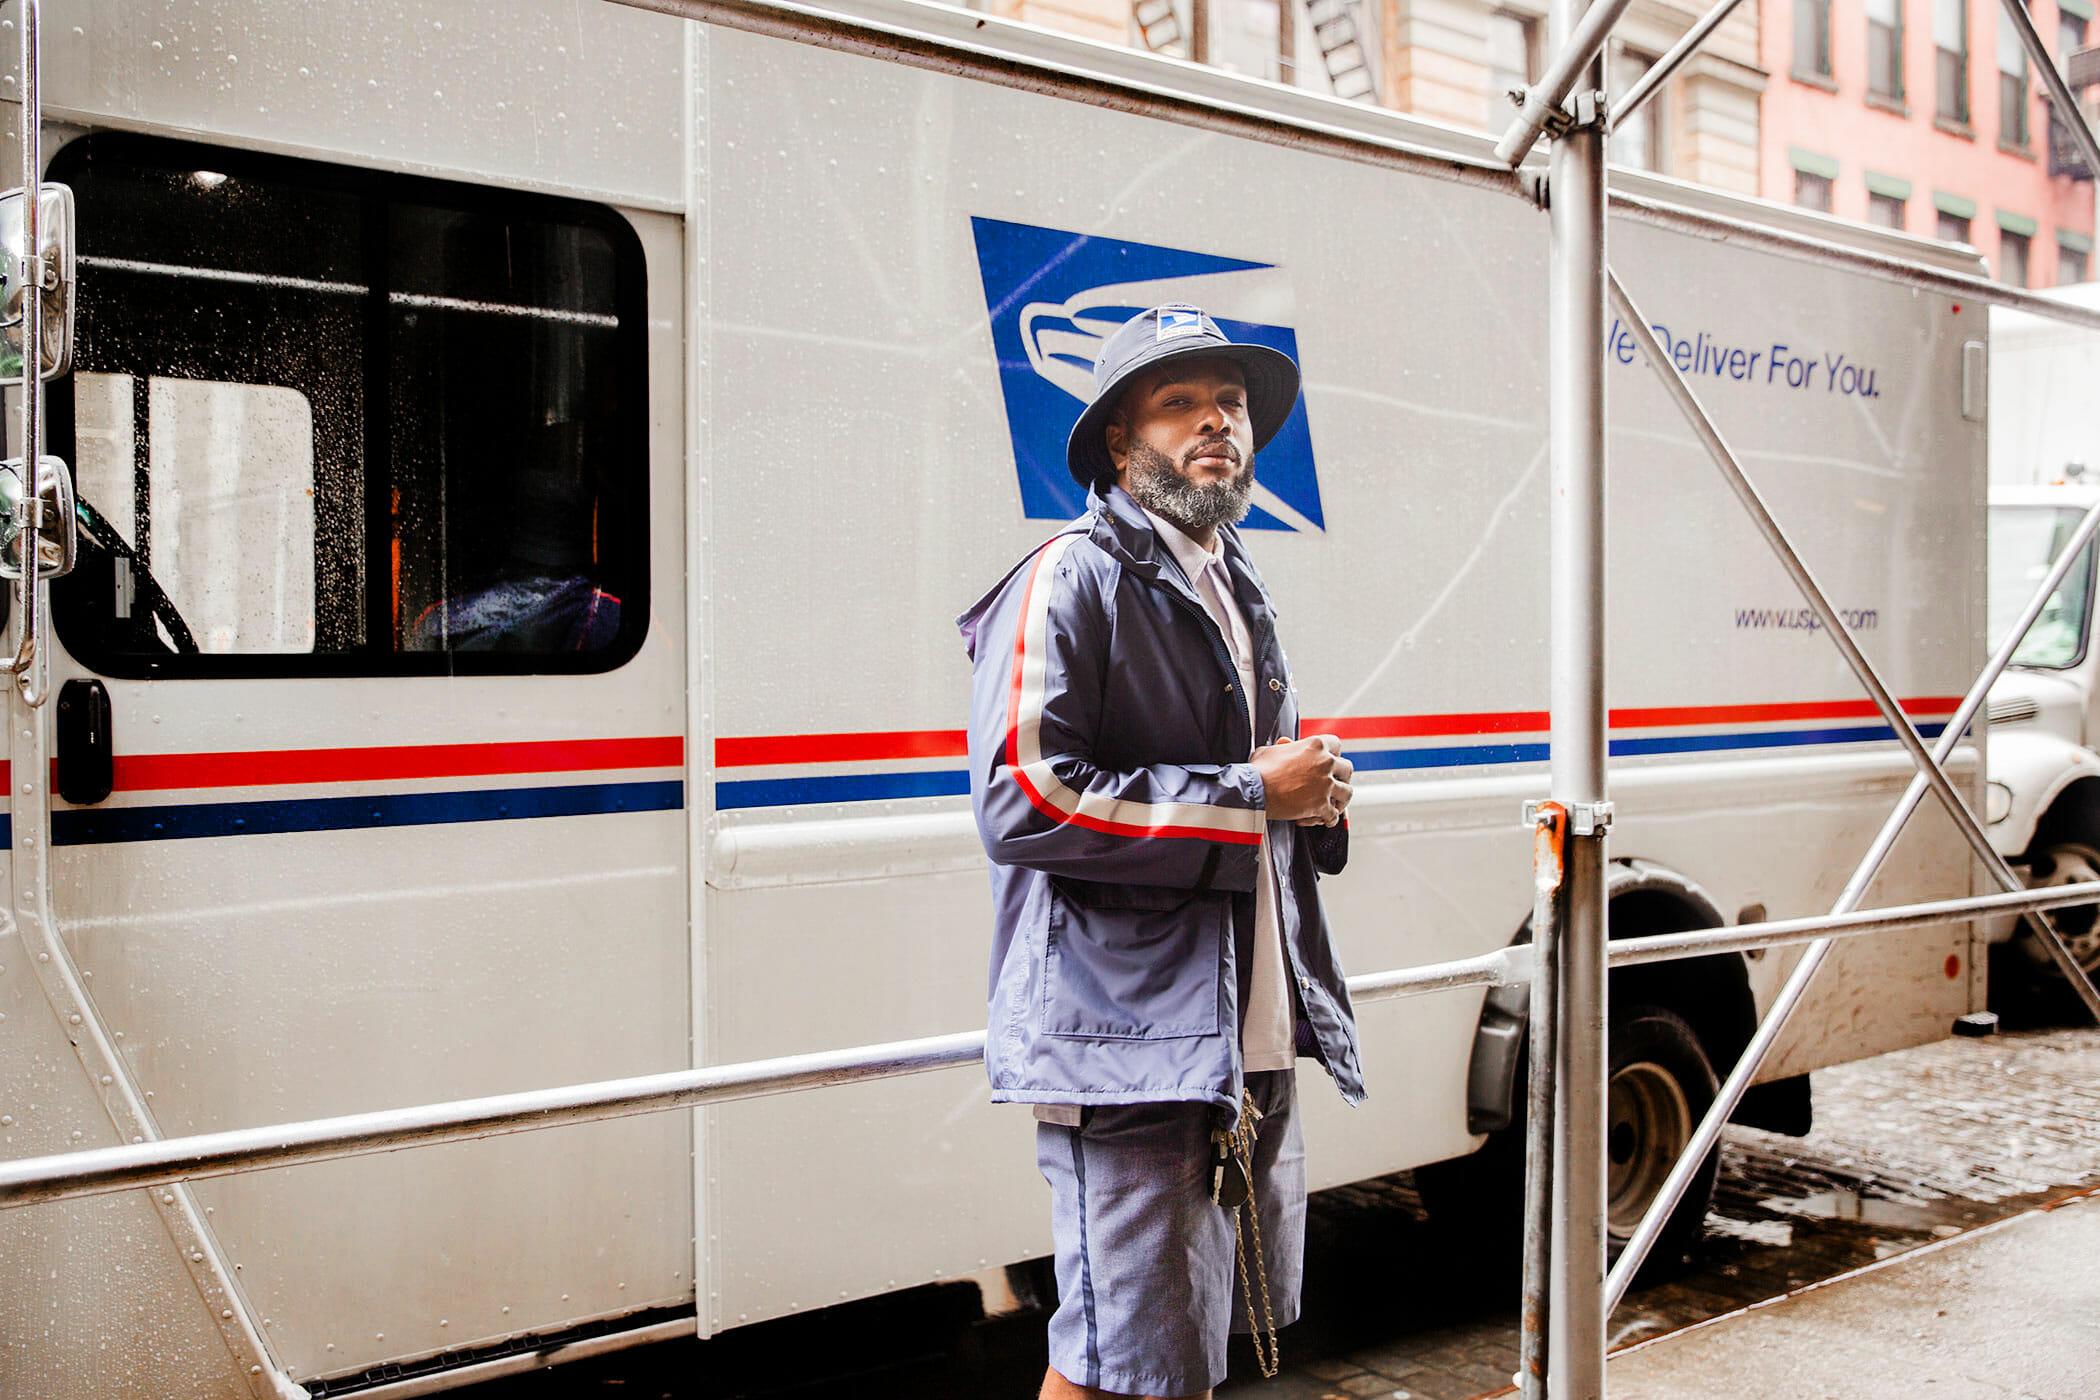 MR HQ mail guy profile man repeller